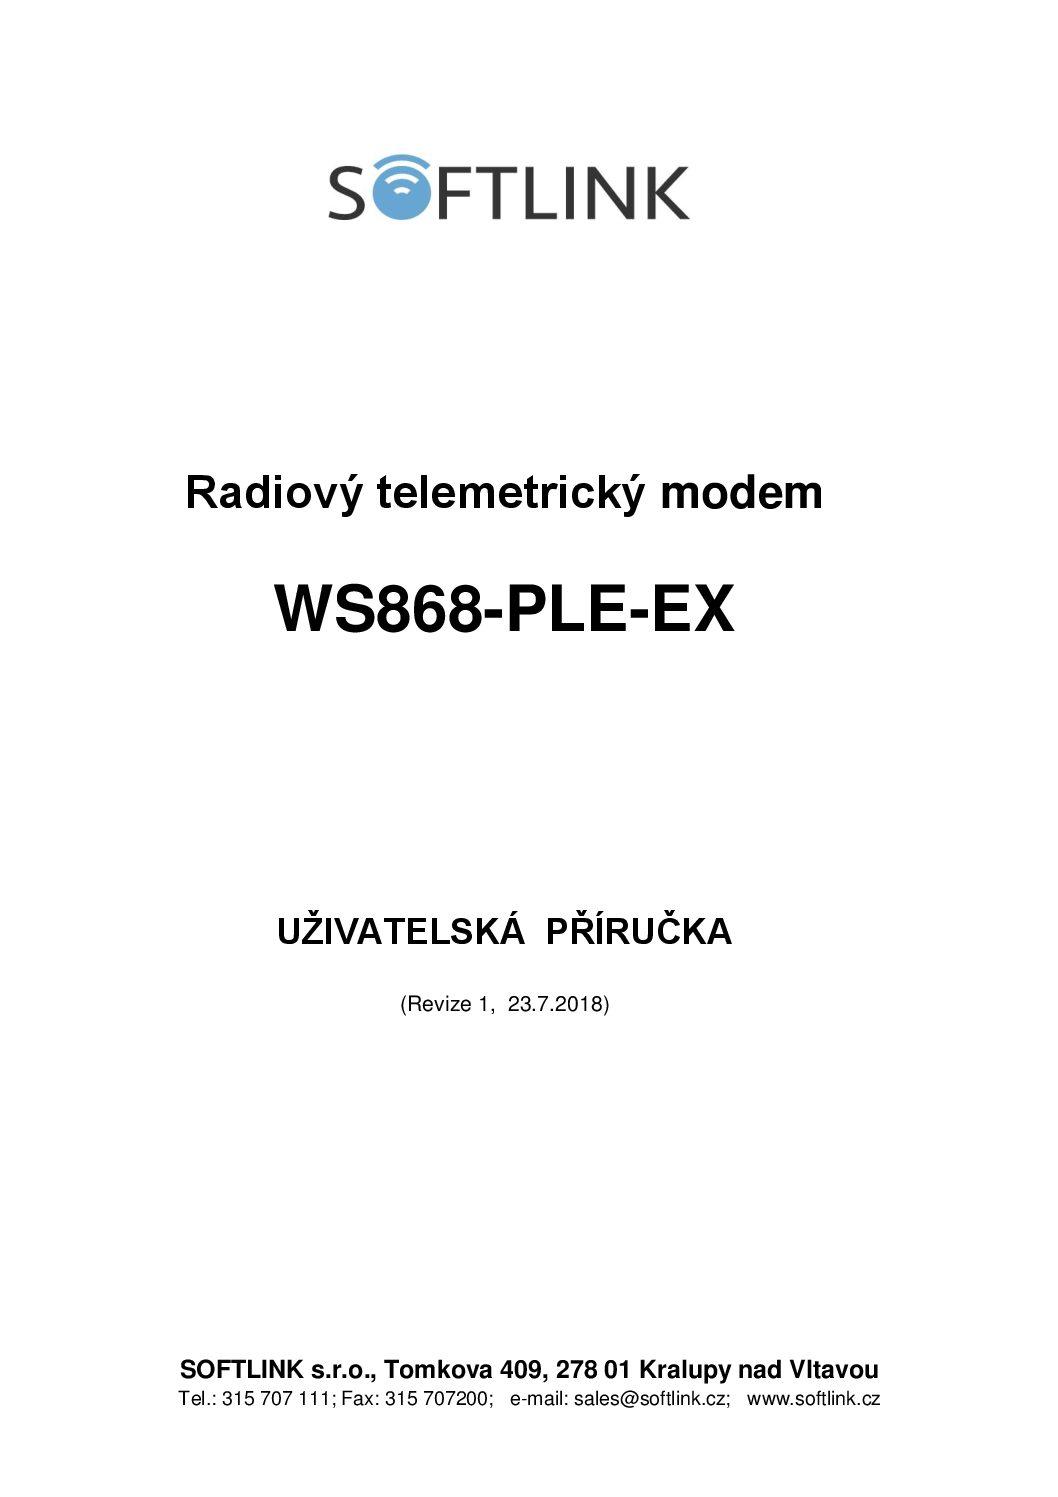 Manual_WS868-PLE-EX